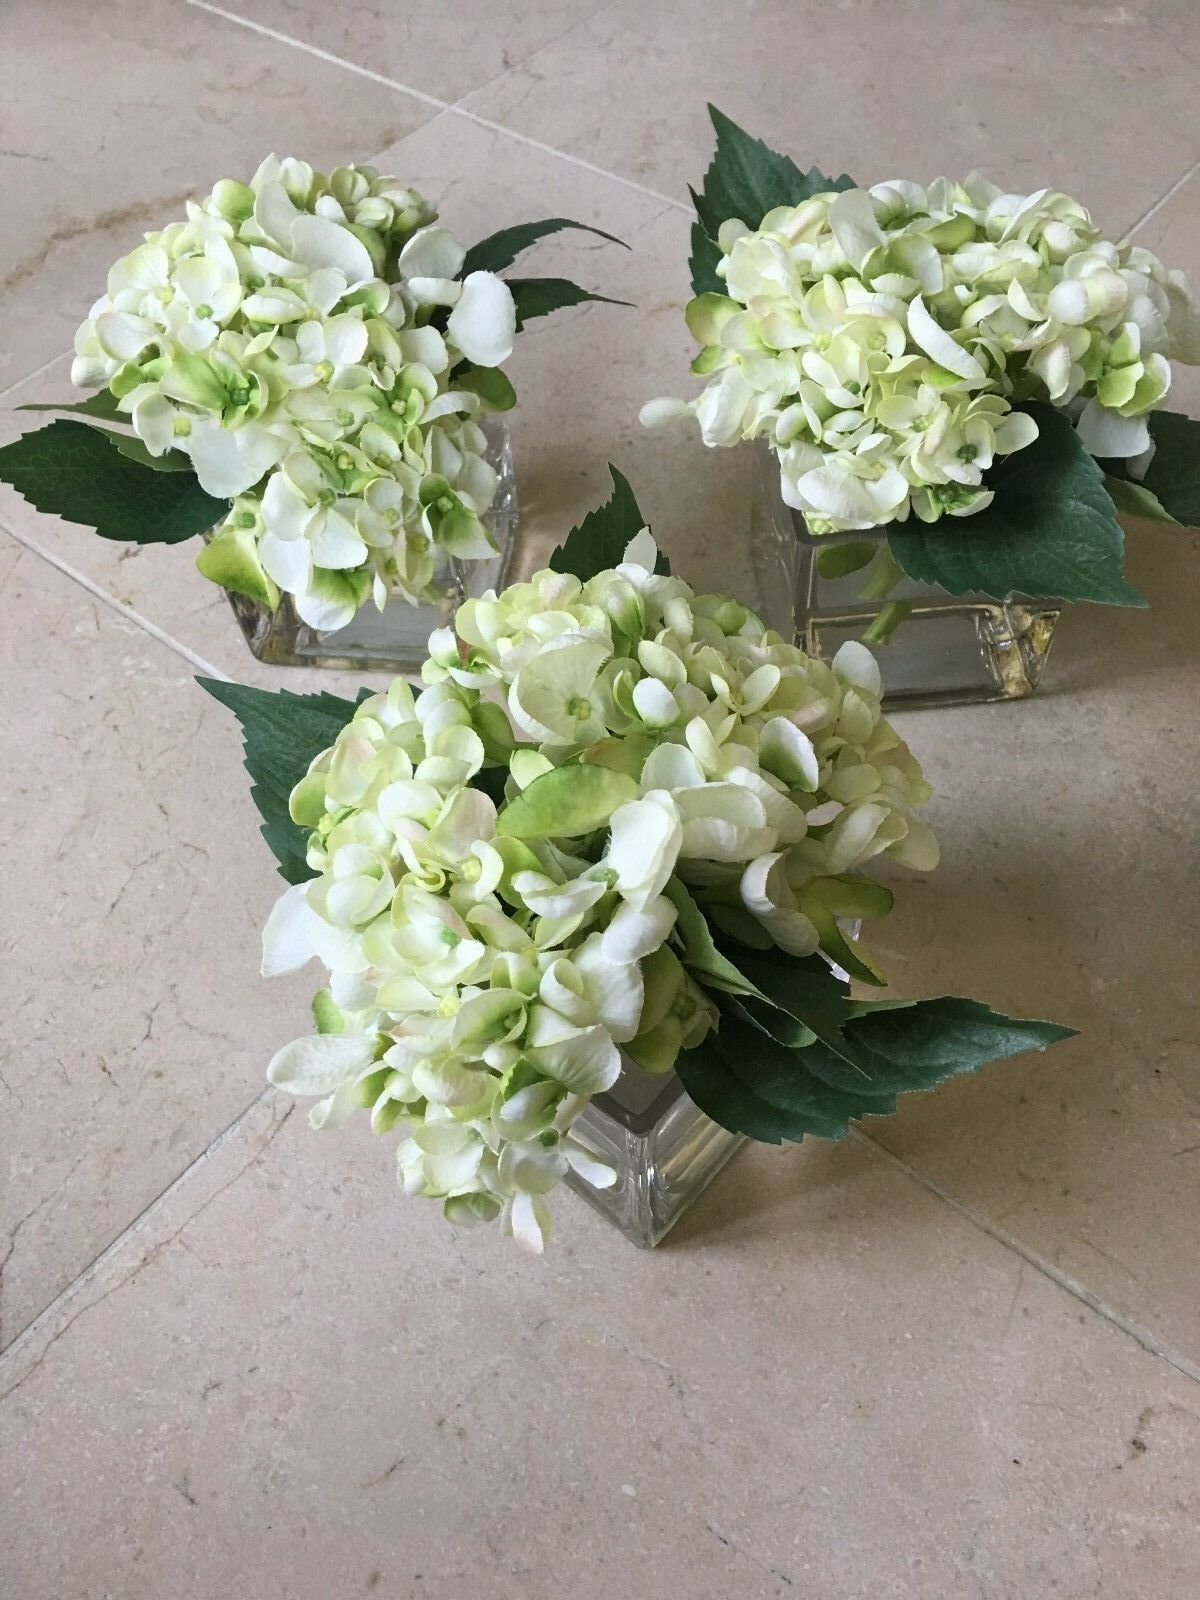 NDI Floral Petite Set of Three Weiß Hydrangeas Arrangement in Acrylic Water